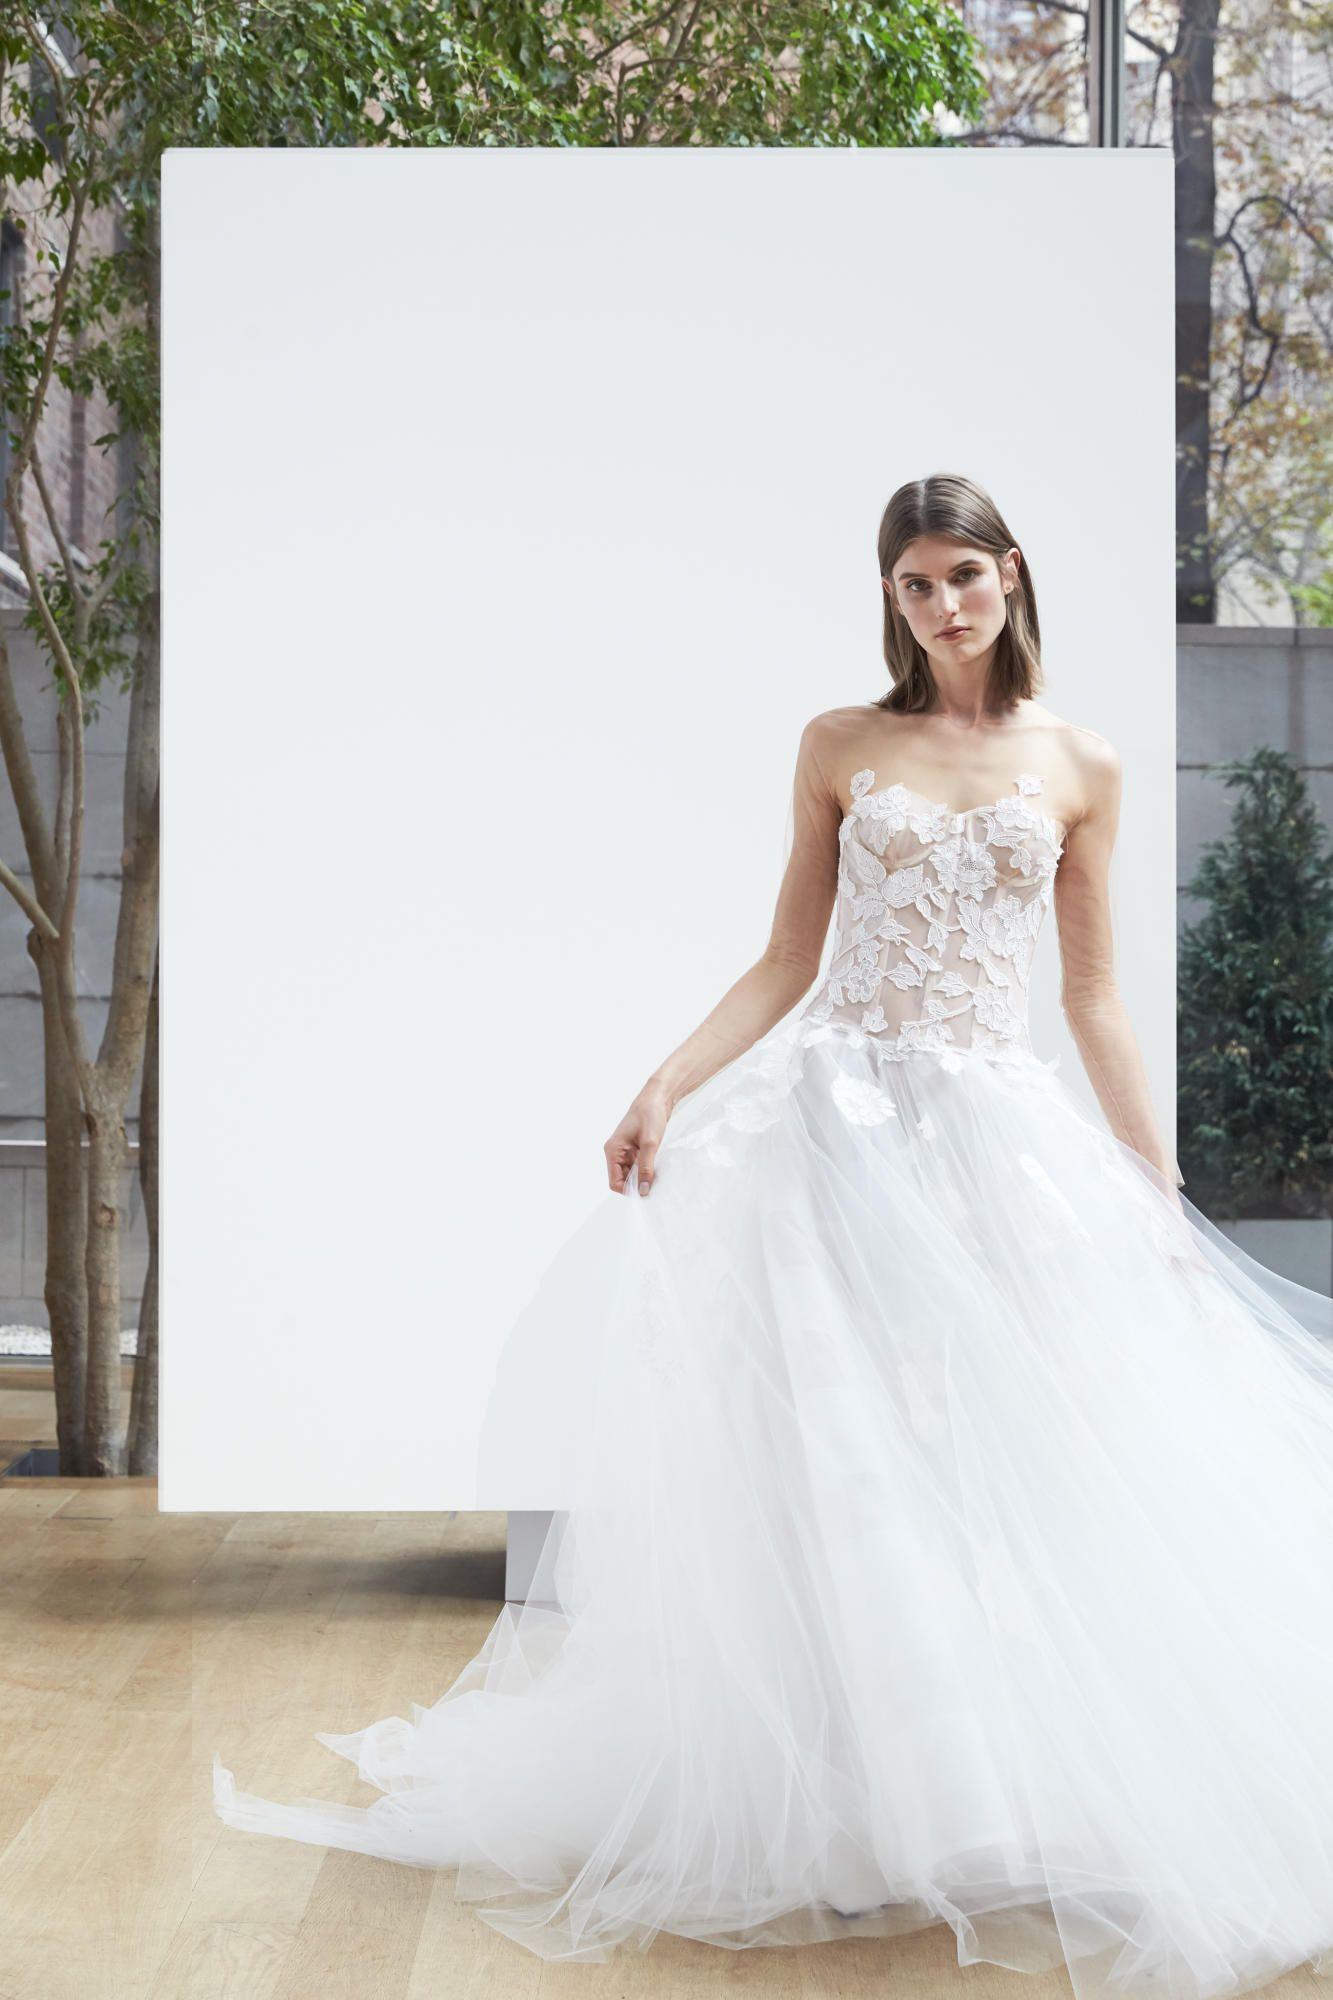 oscar-de-la-renta-bridal-spring-2018-corset-dress Tendências de vestidos de noiva para 2018